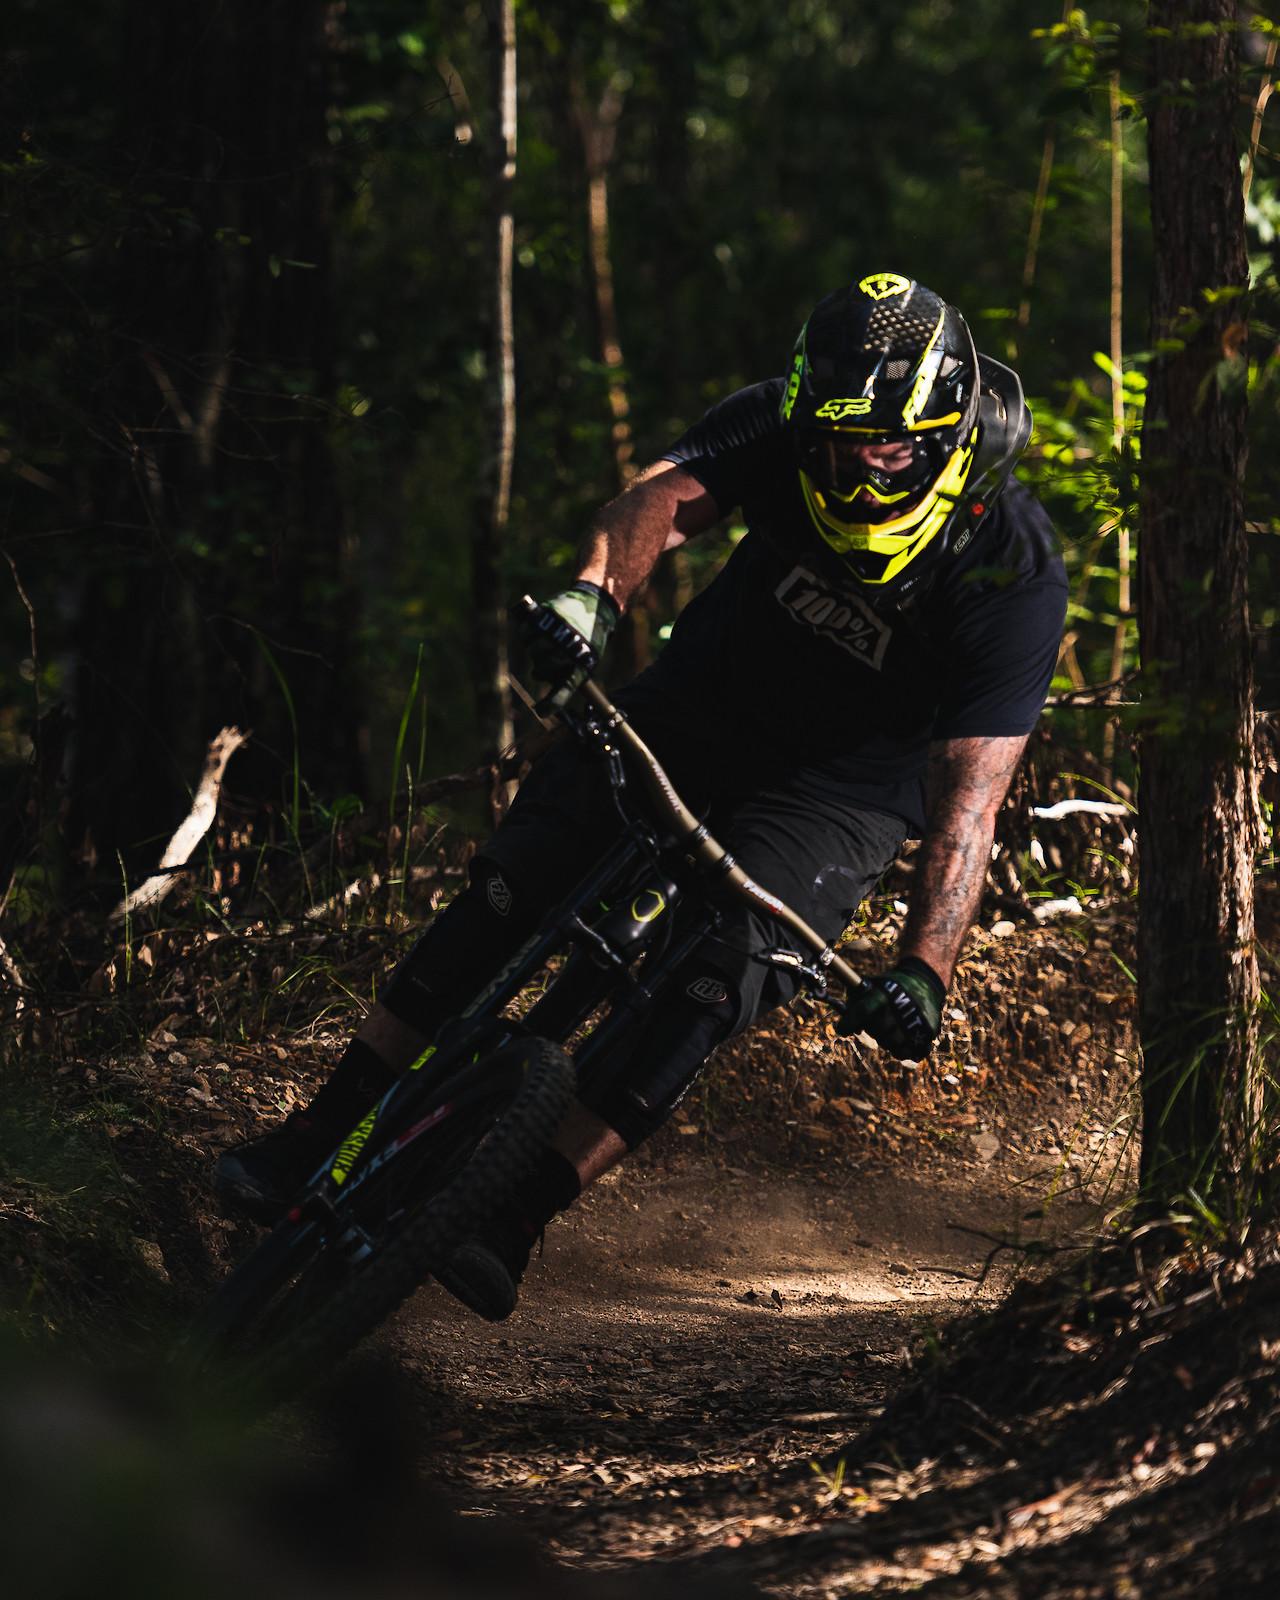 Tight turn - Zer0mtb - Mountain Biking Pictures - Vital MTB